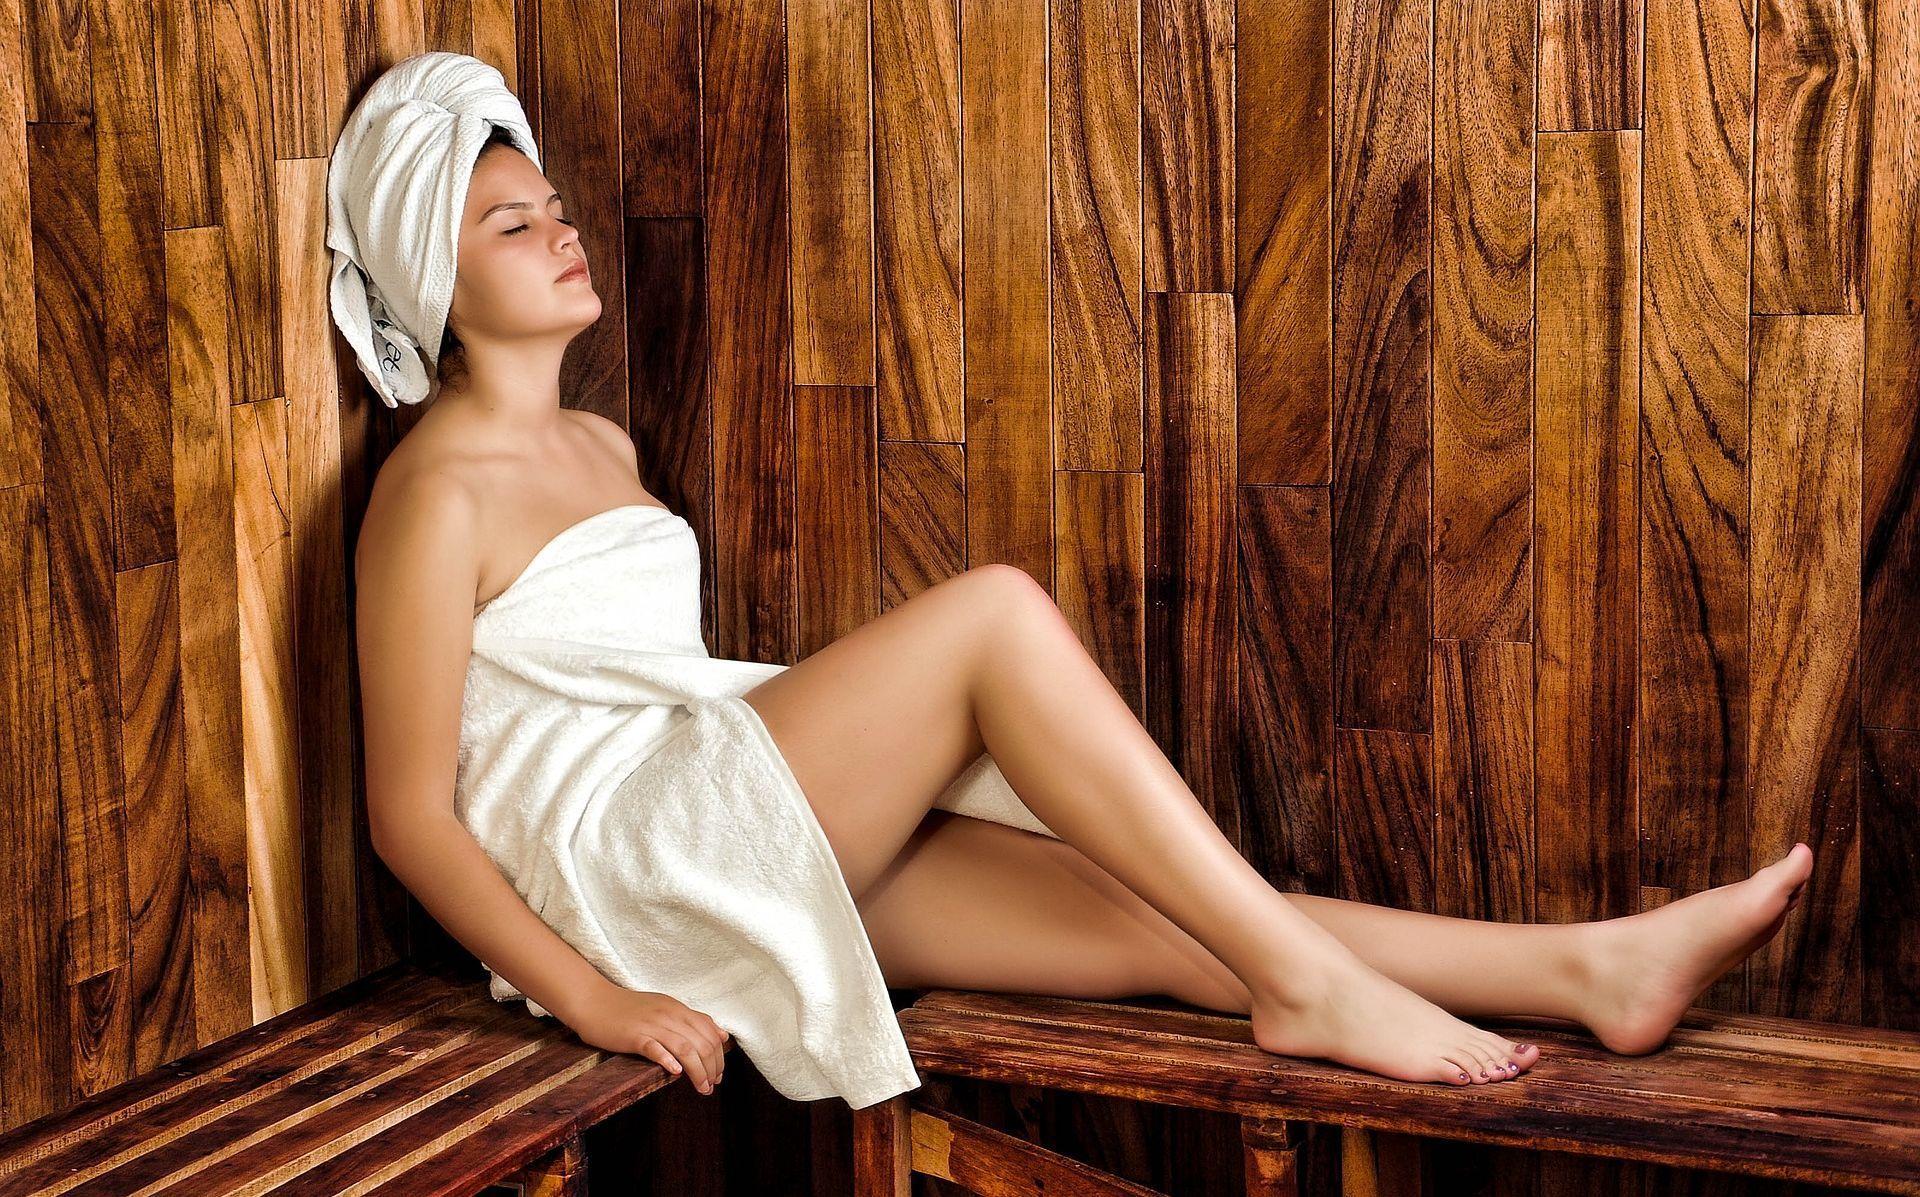 sauna benefici rischi